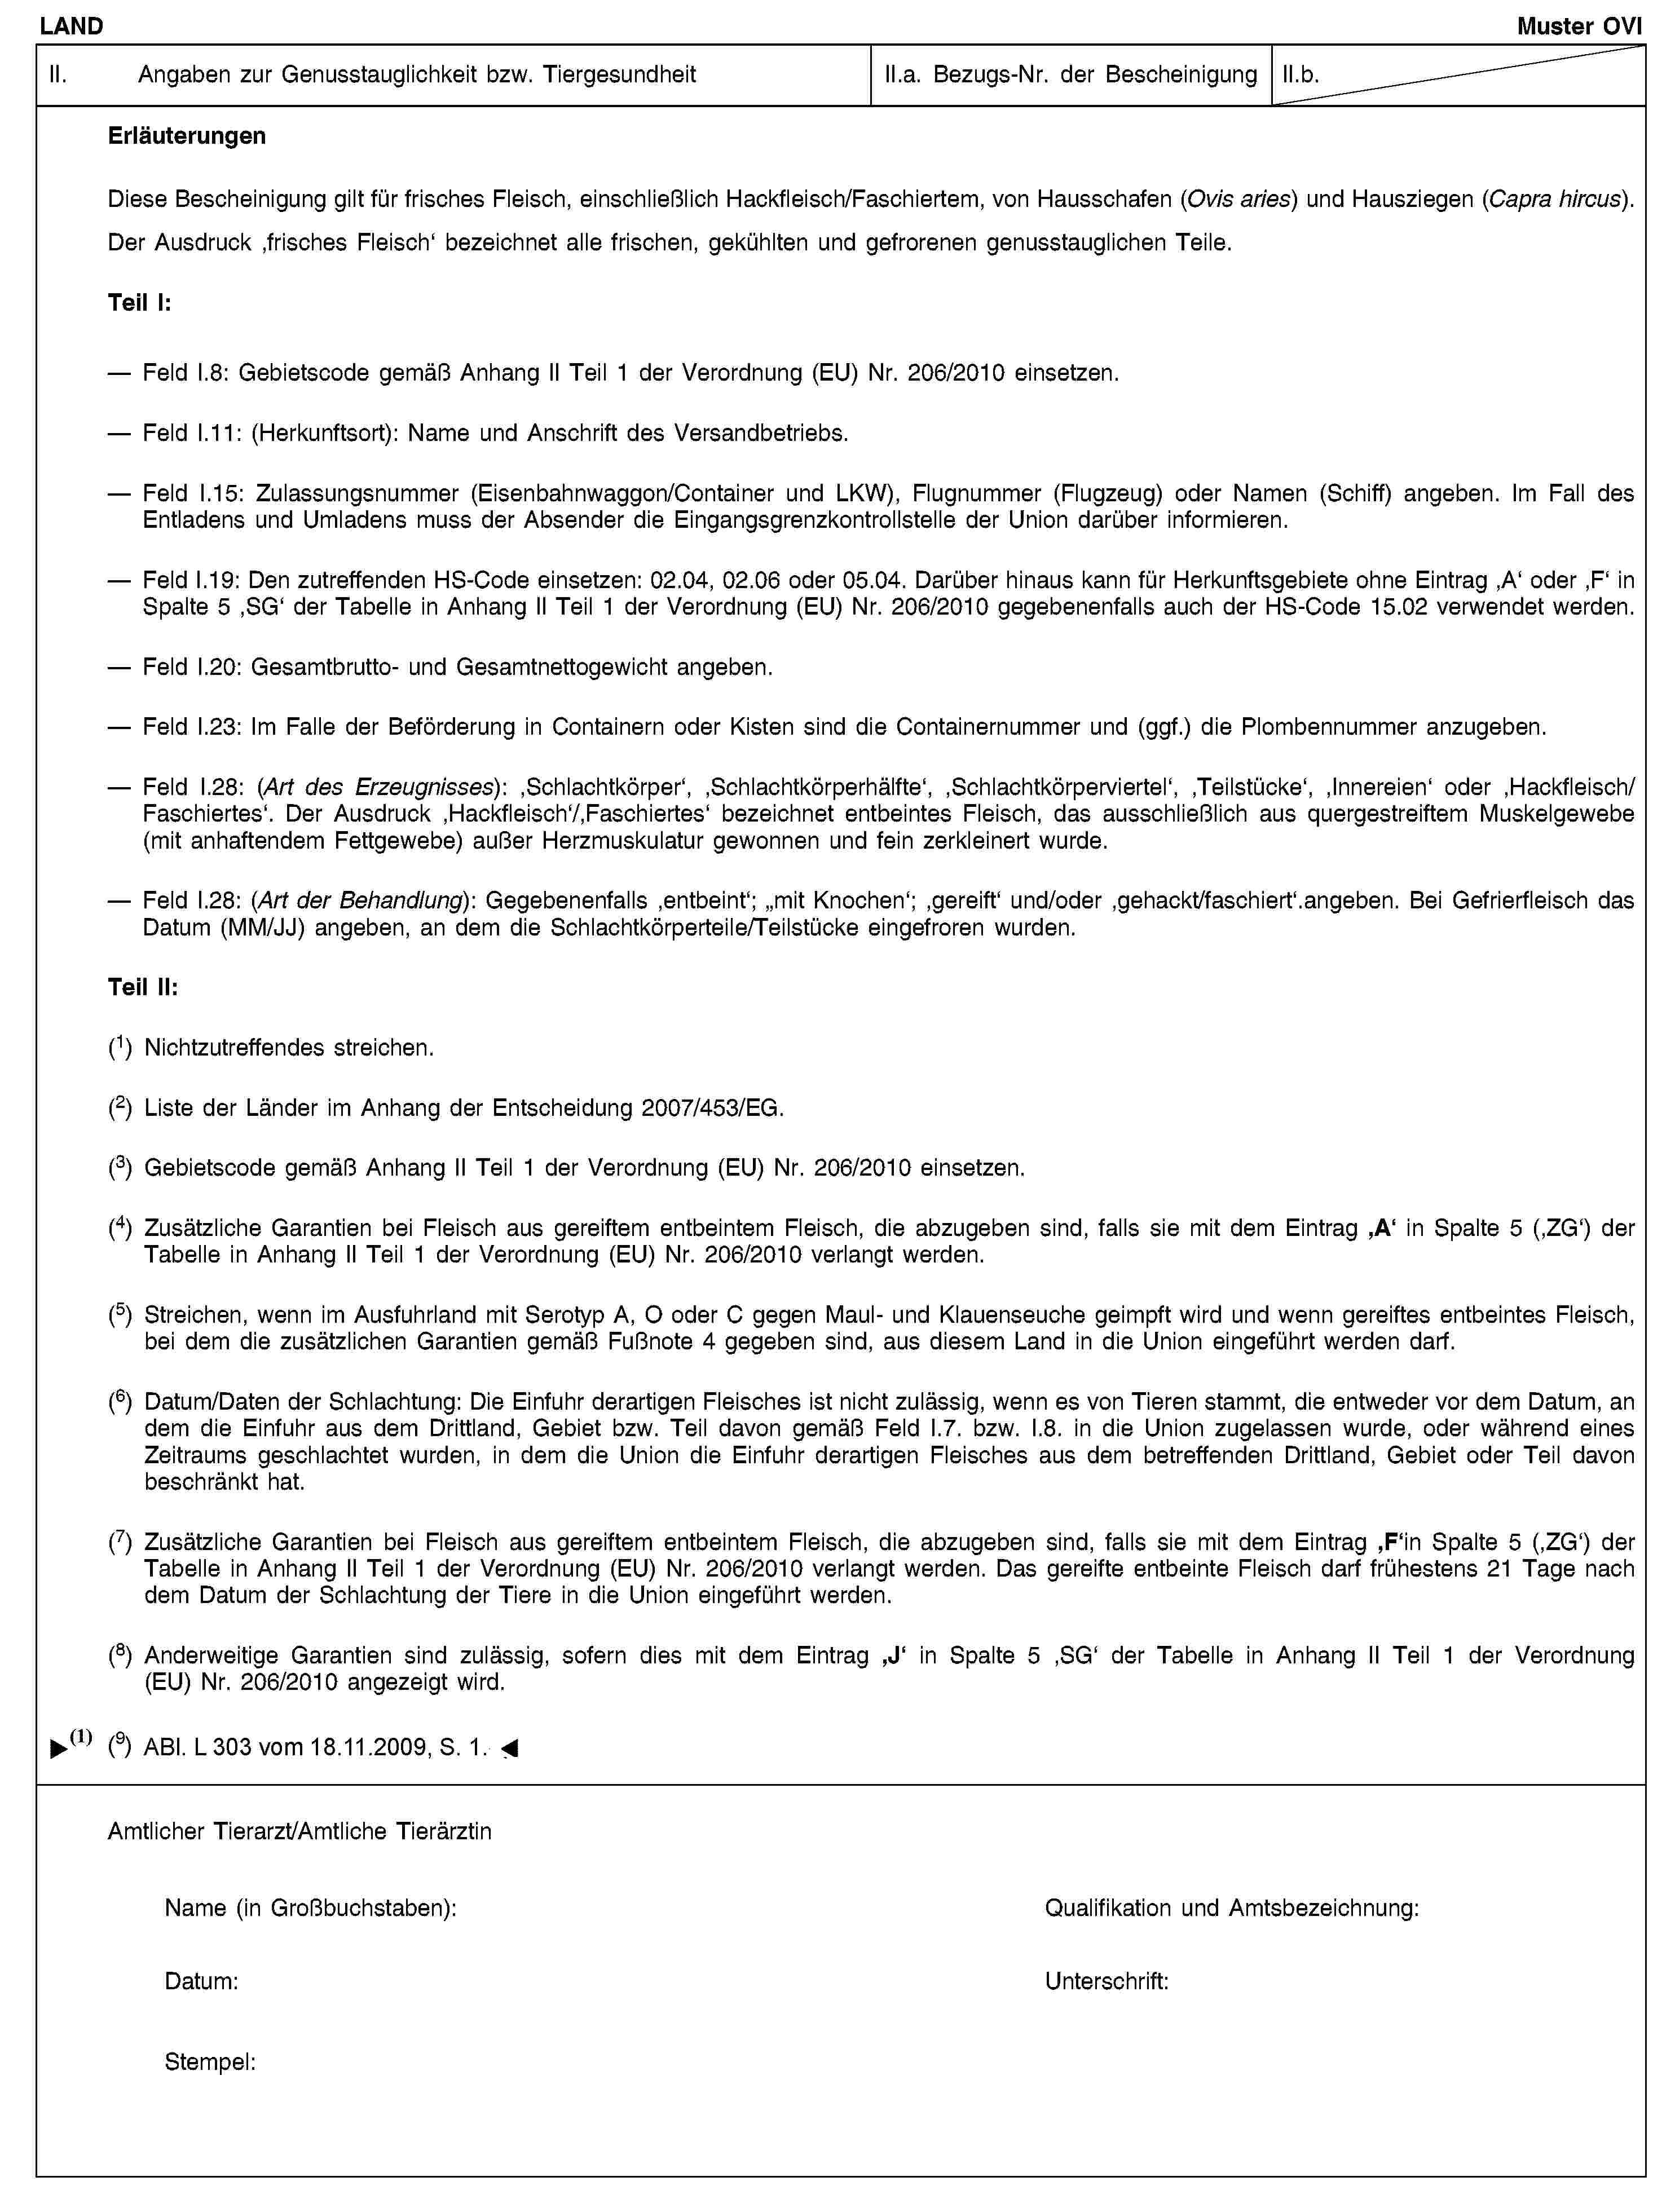 EUR-Lex - 02010R0206-20150617 - EN - EUR-Lex